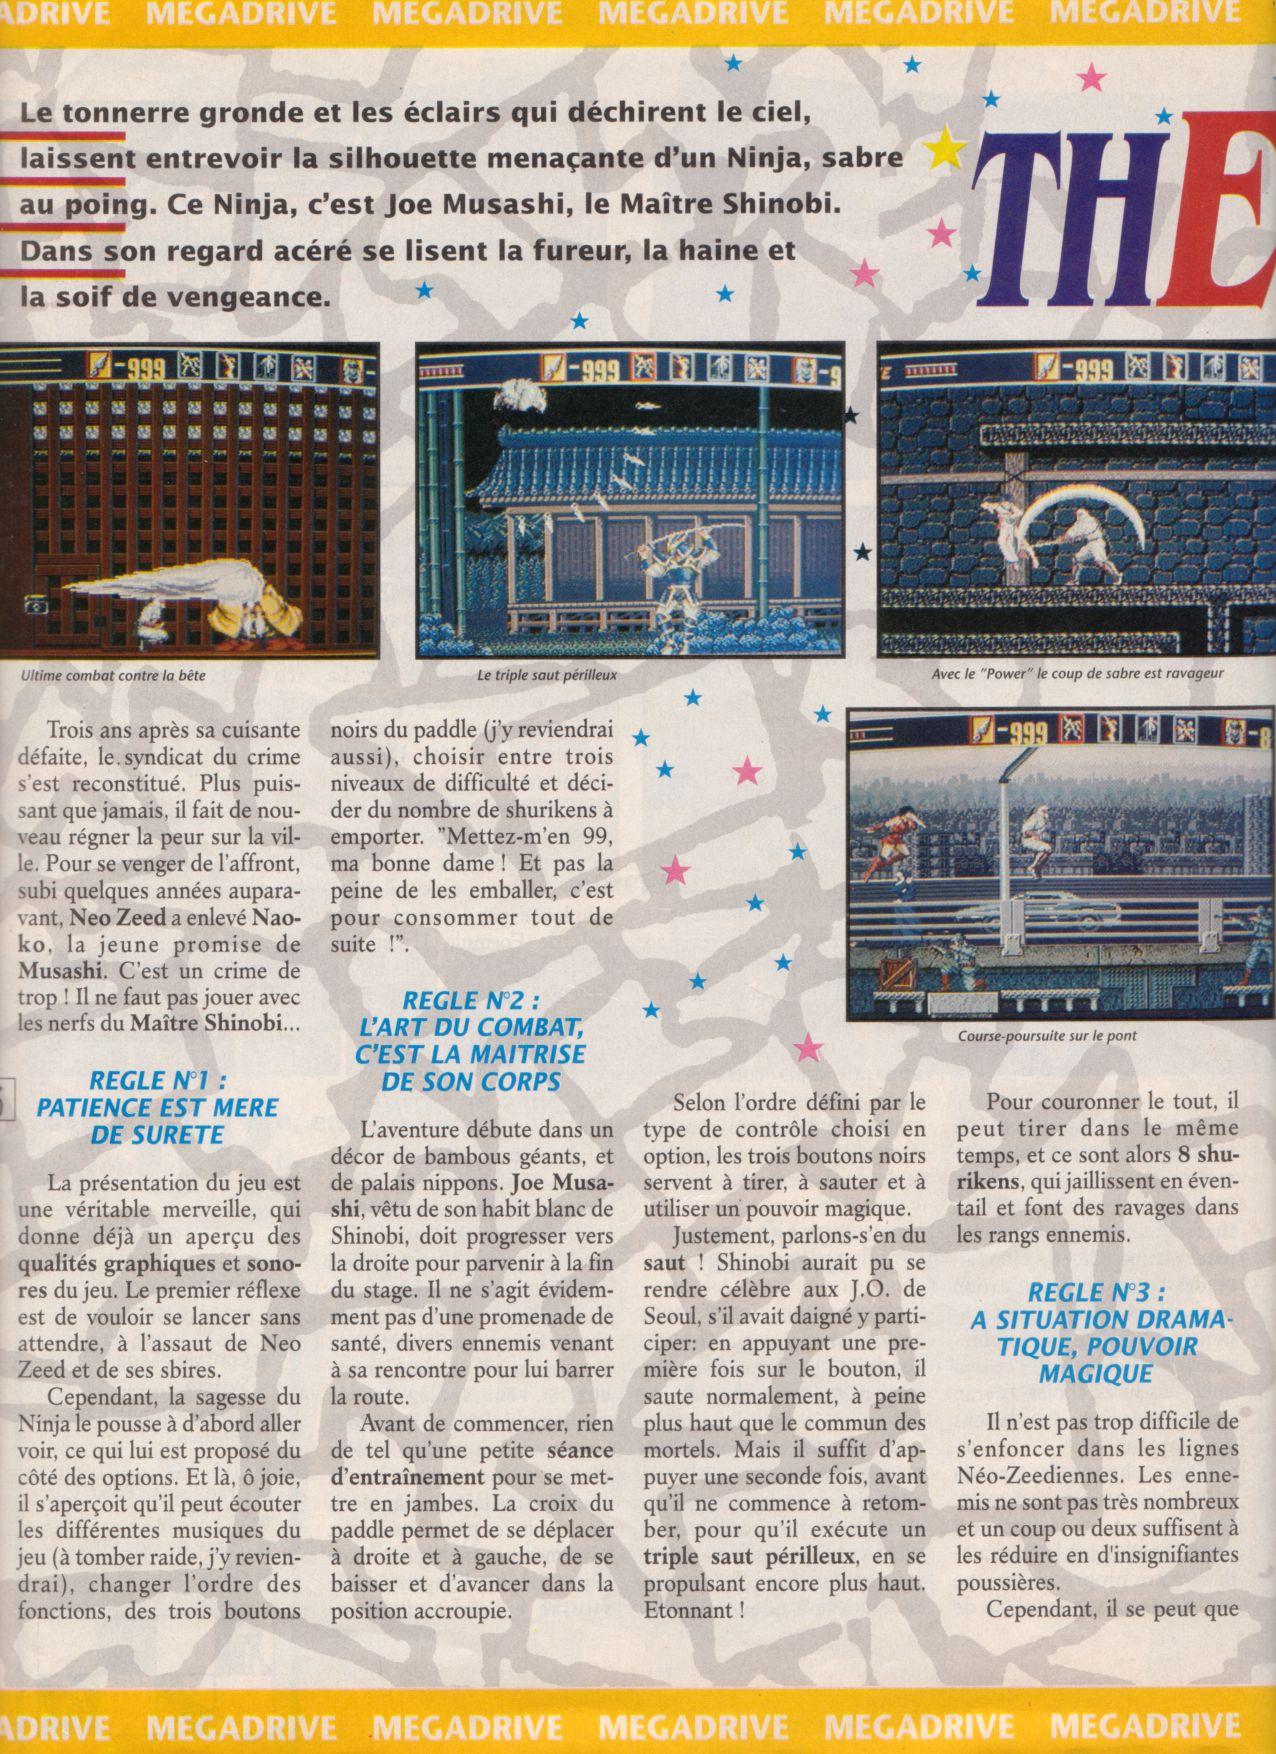 [Jeux]   THE REVENGE OF SHINOBI (Megadrive ) 1989. Player%20One%20002%20-%20Page%20036%20(1990-10)